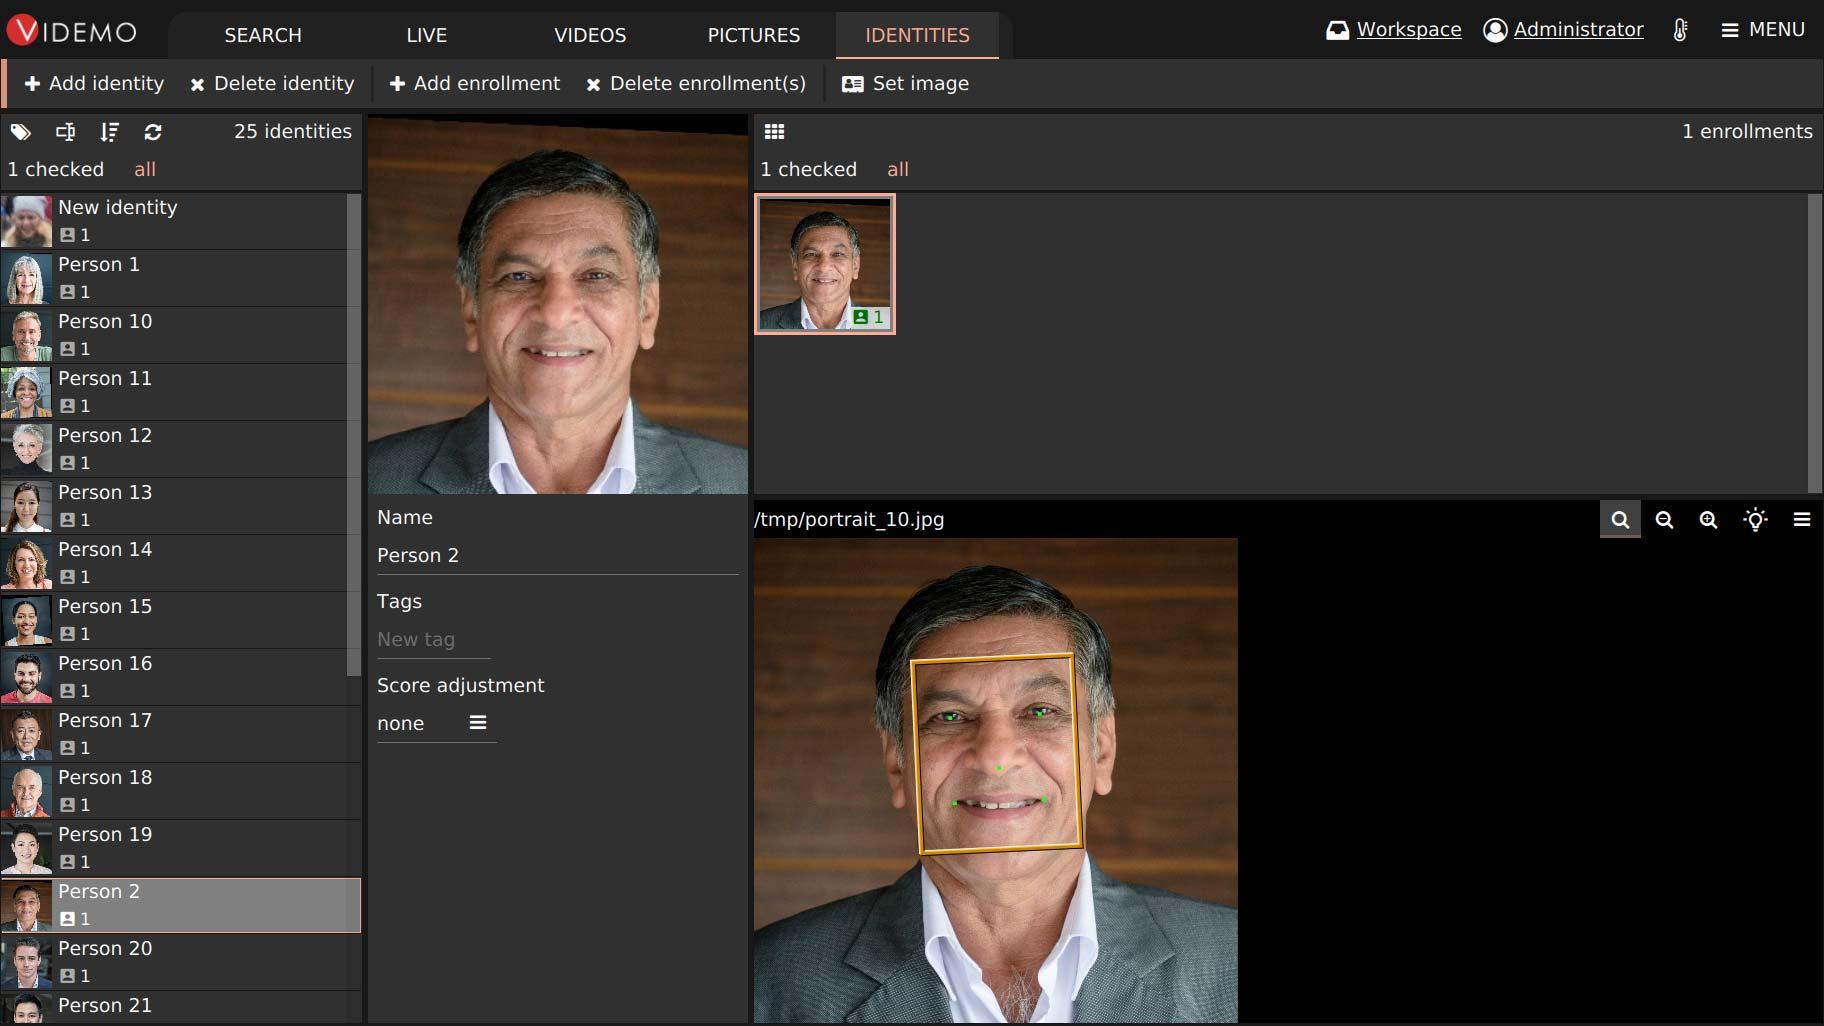 Videmo - New standard in video analysis